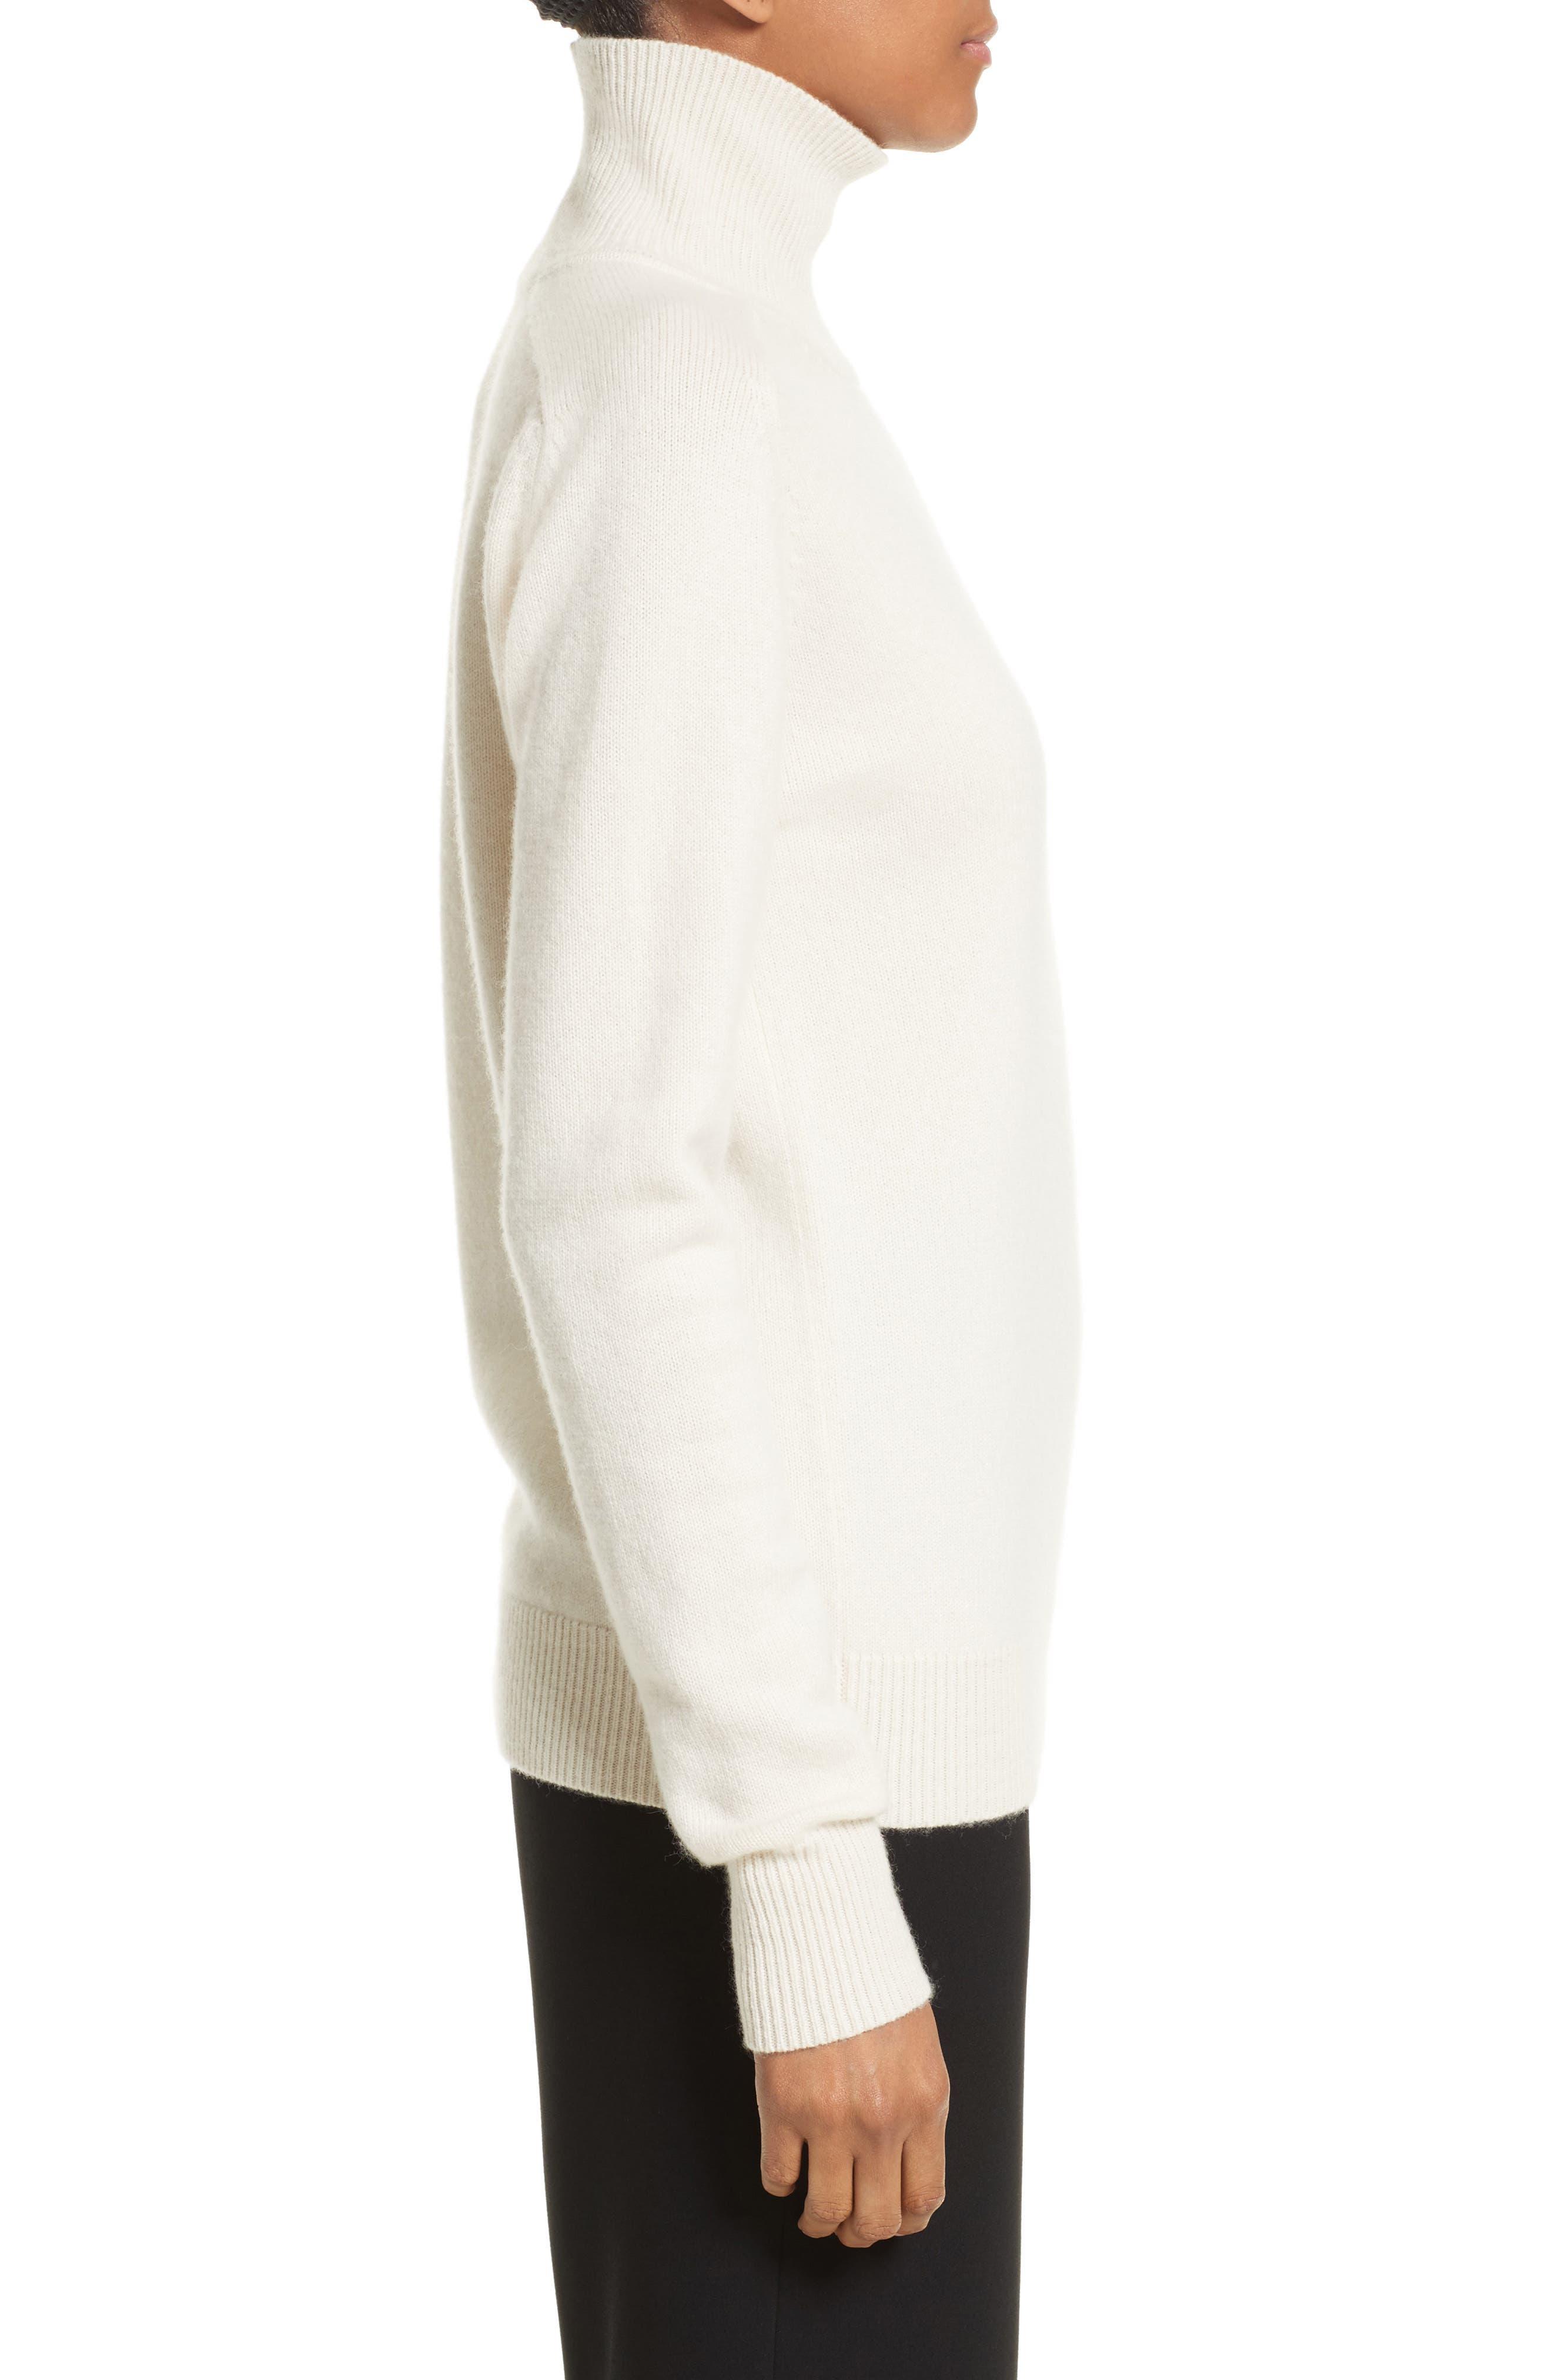 VICTORIA BECKHAM, Cashmere Turtleneck Sweater, Alternate thumbnail 3, color, VANILLA